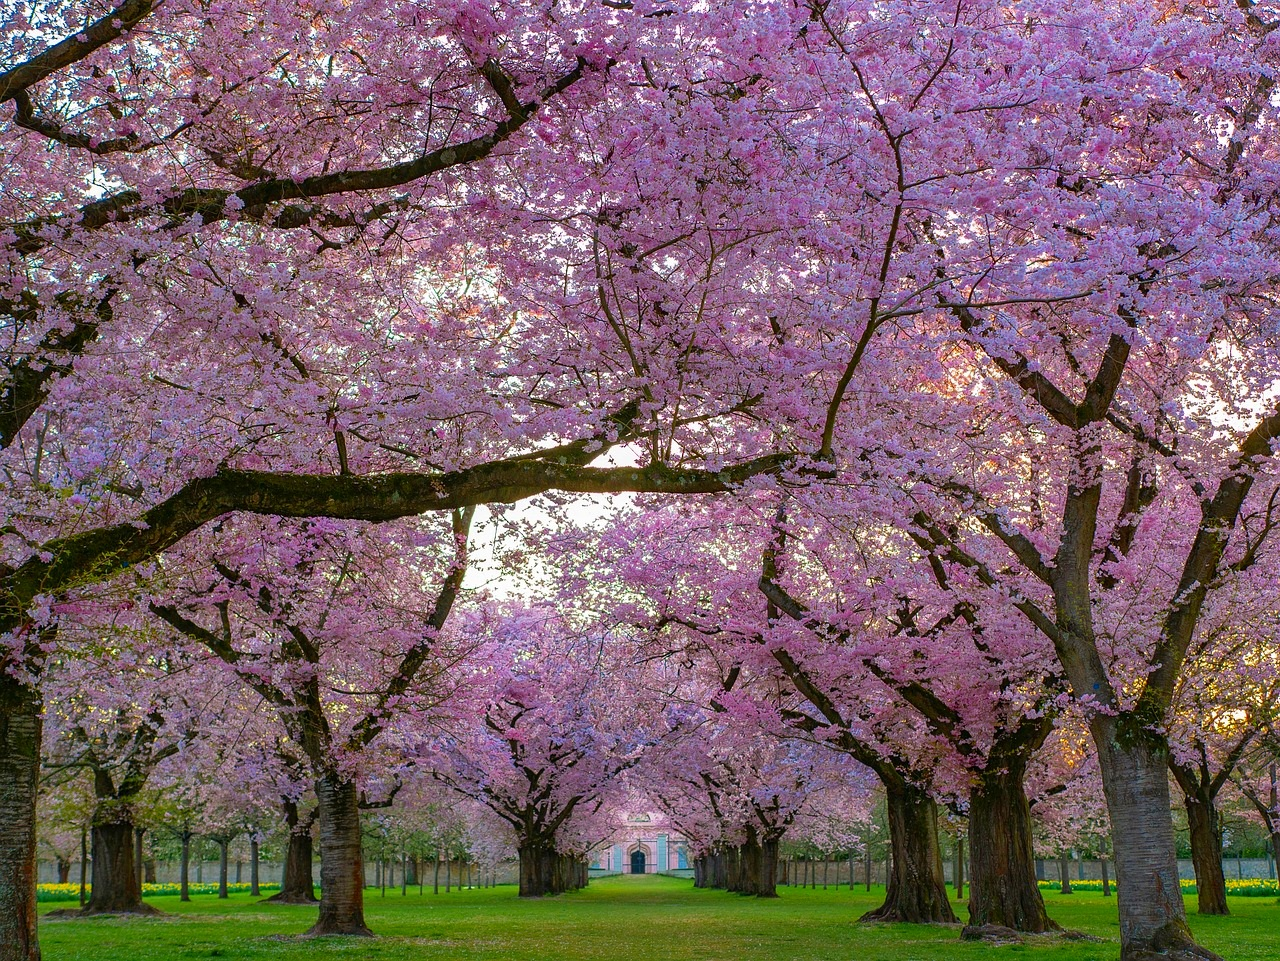 trees-4092265_1280.jpg